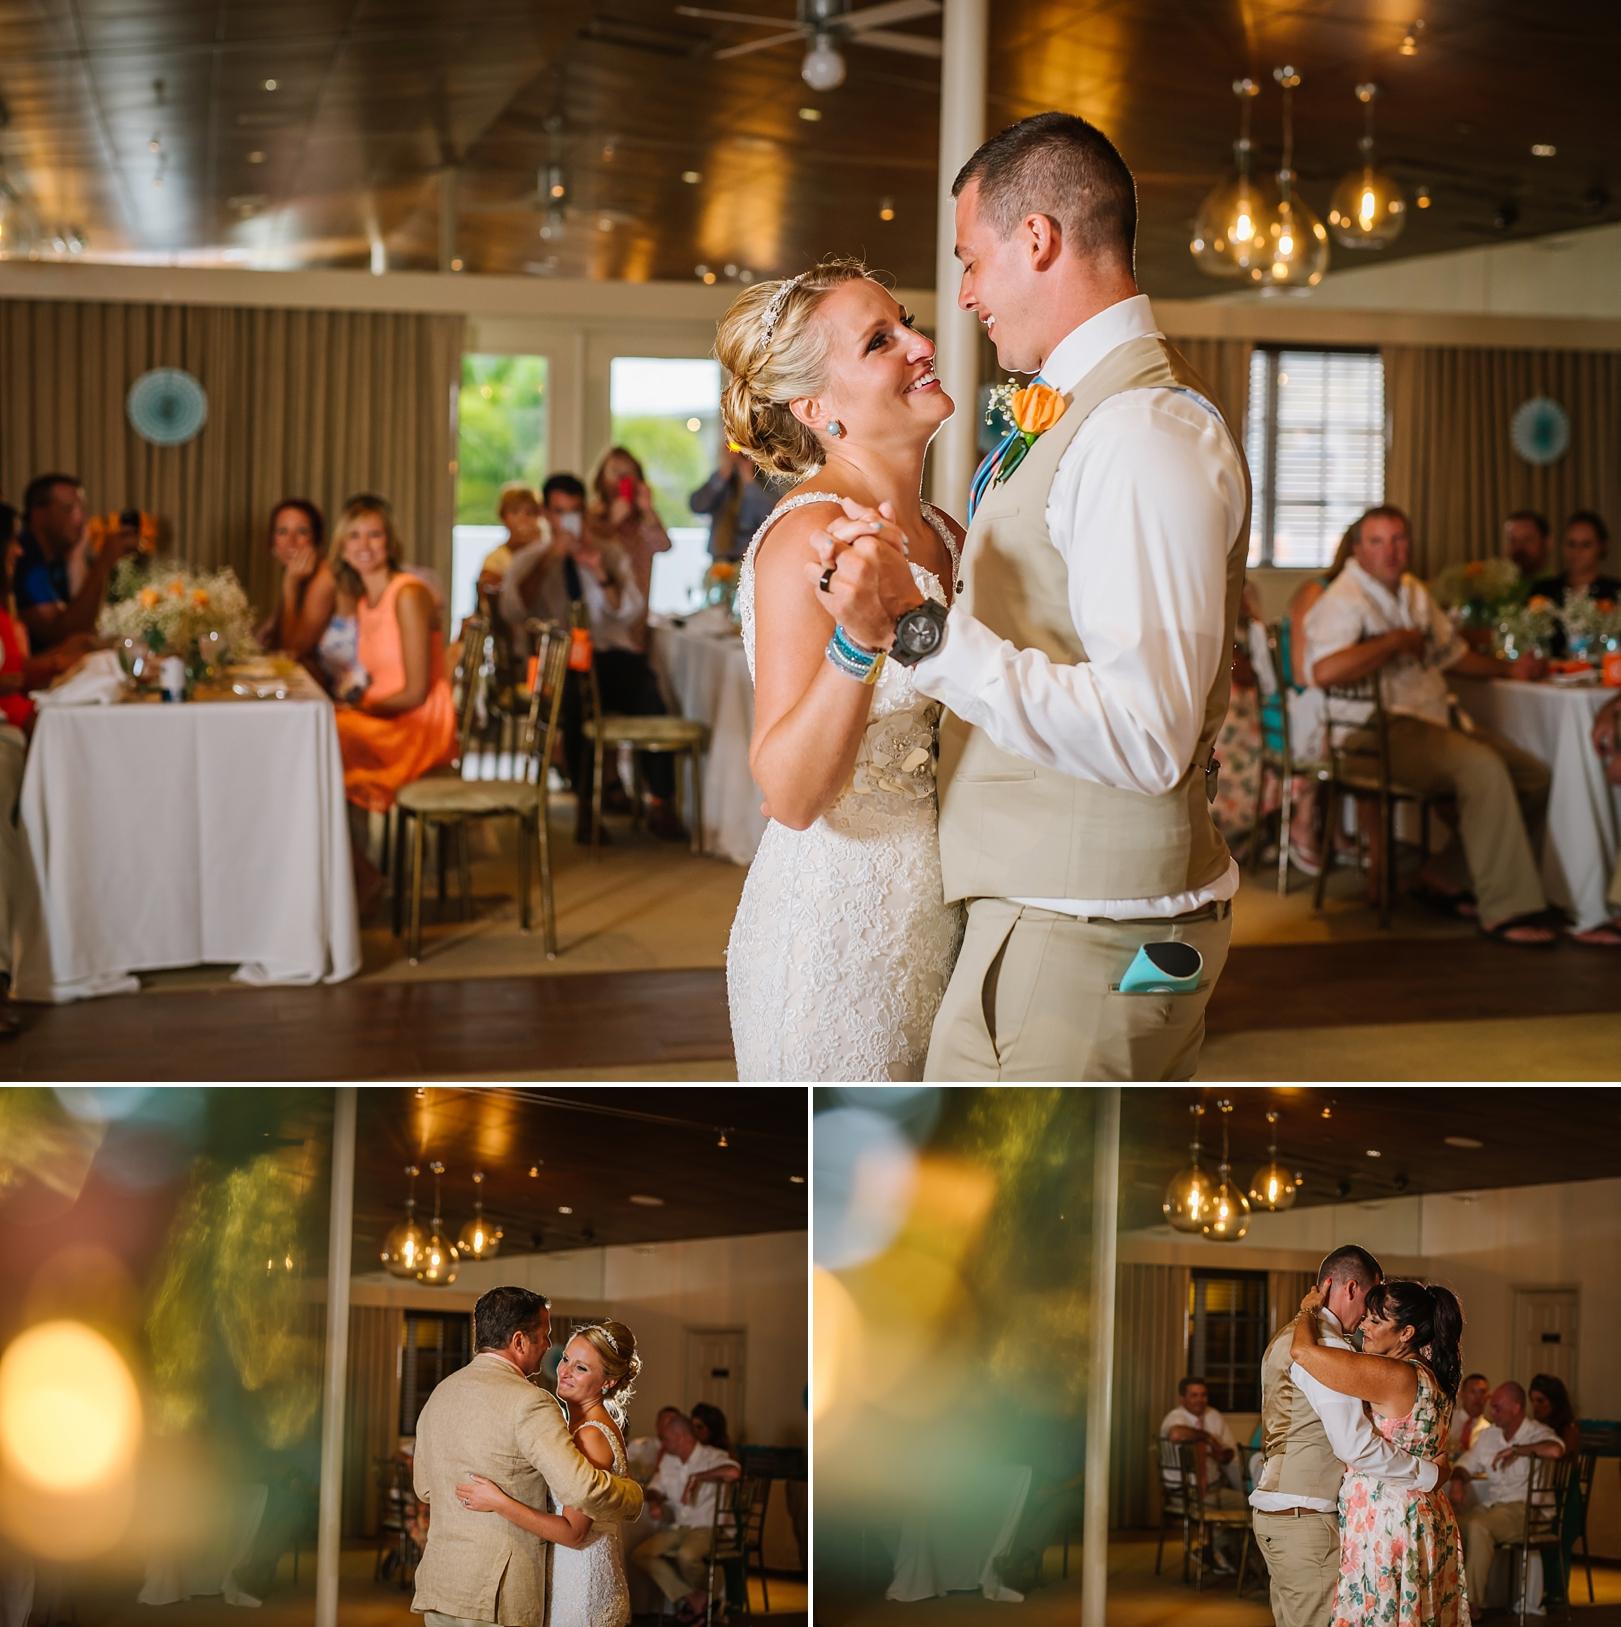 st-pete-postcard-inn-colorful-diy-wedding-photography_0023.jpg